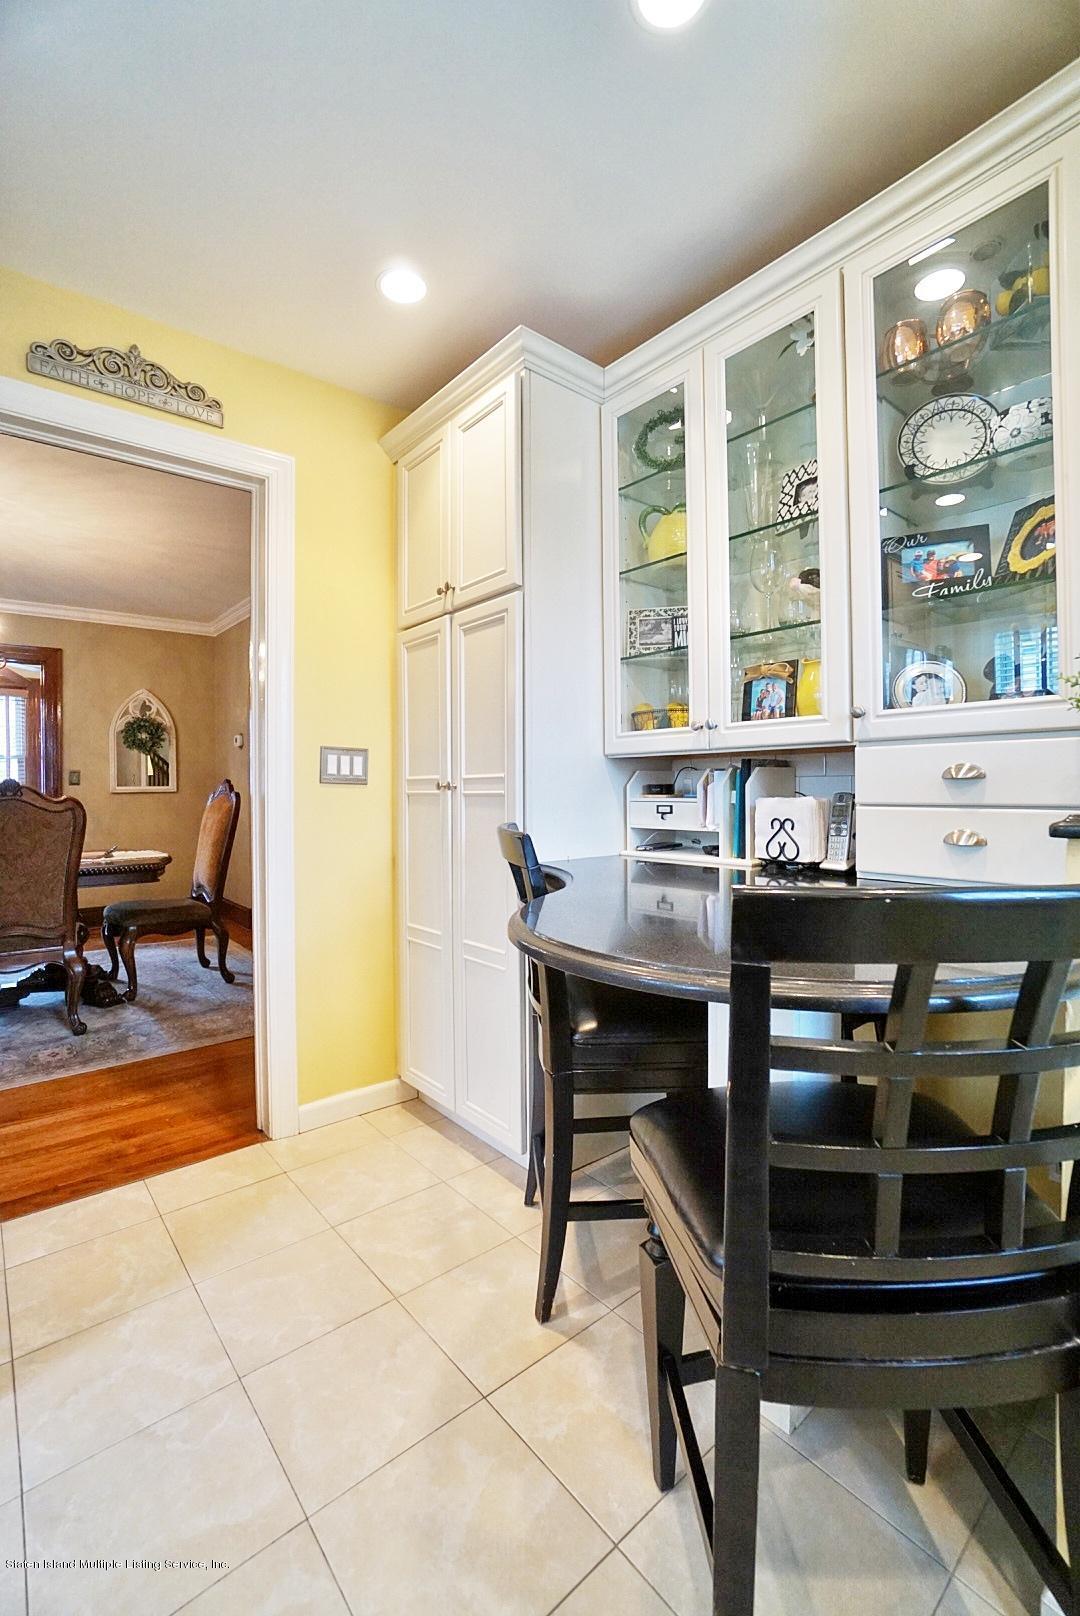 Single Family - Detached 171 Keiber Court  Staten Island, NY 10314, MLS-1127425-19